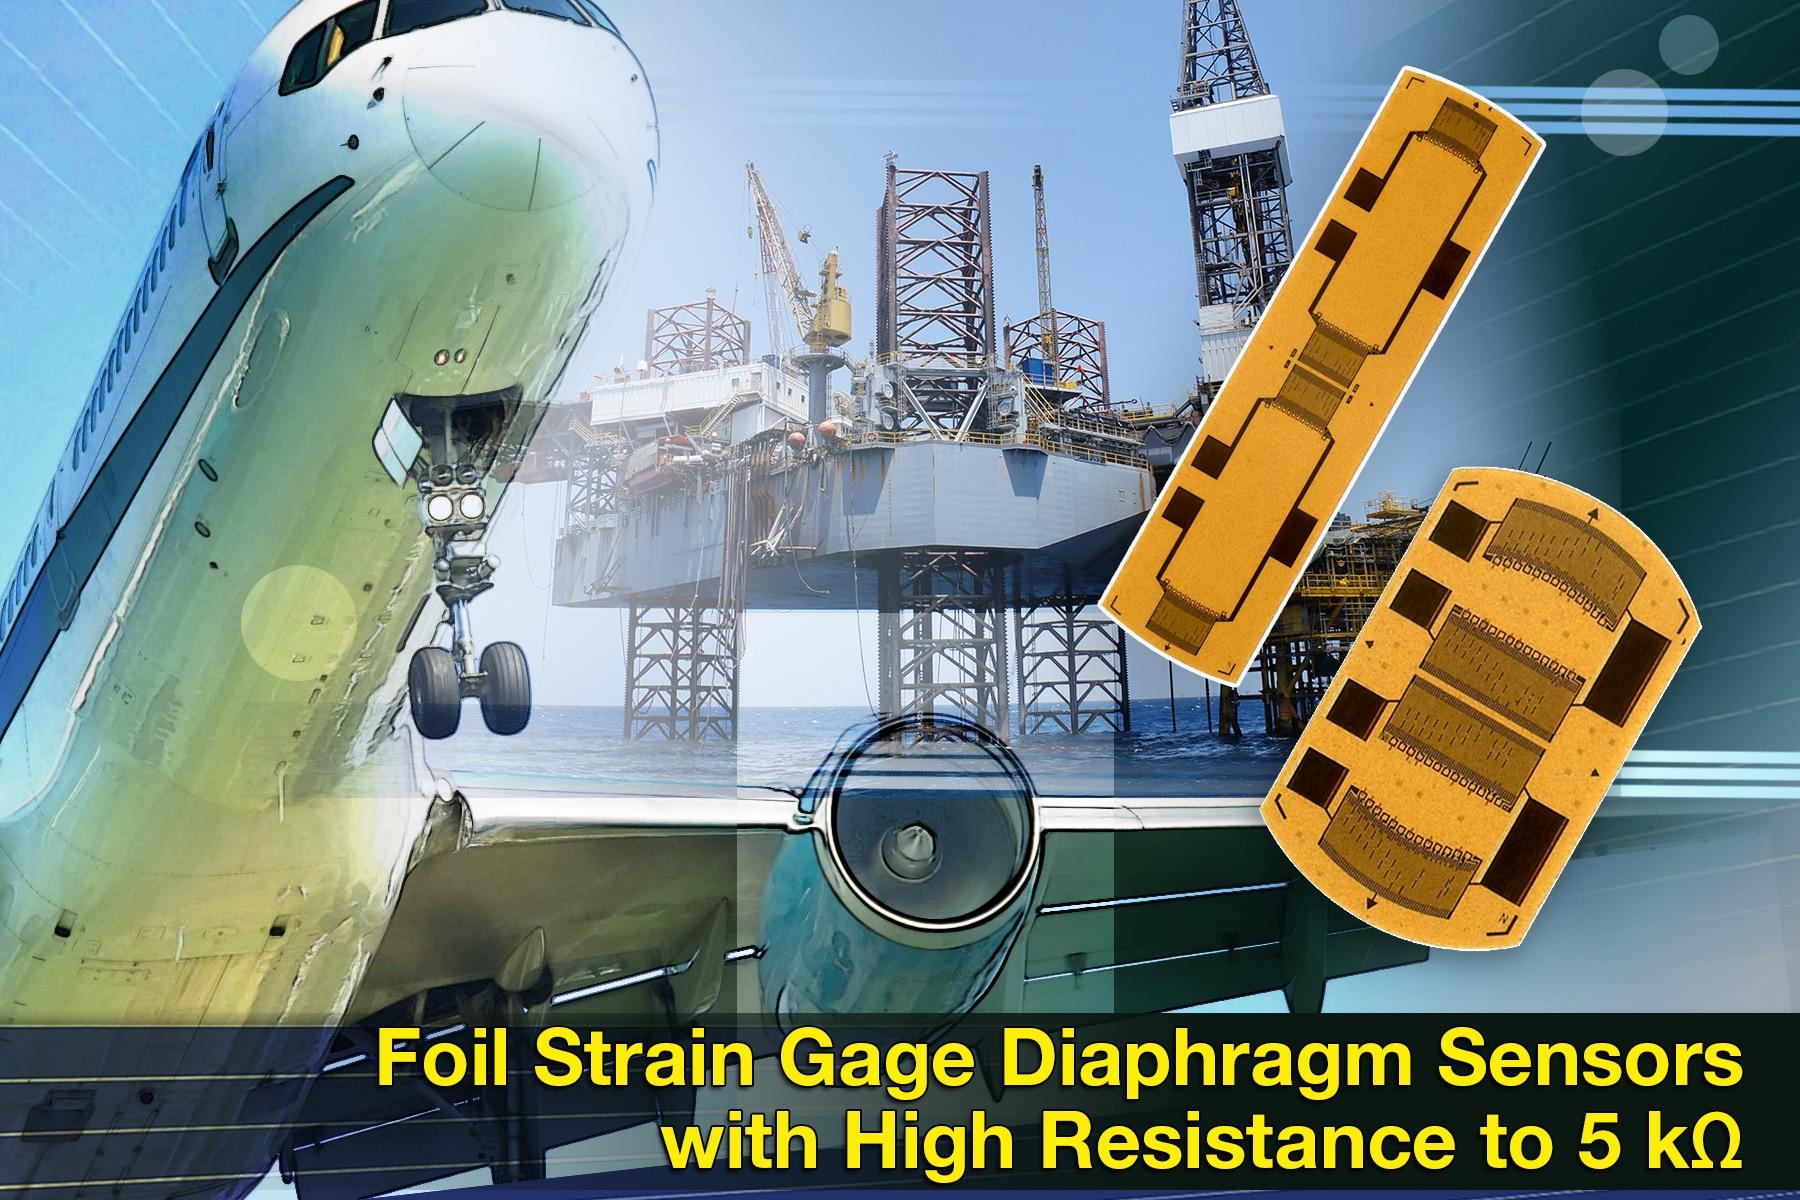 Foil Strain Gage Diaphragm Sensors Offer High Resistance To 5 kΩ